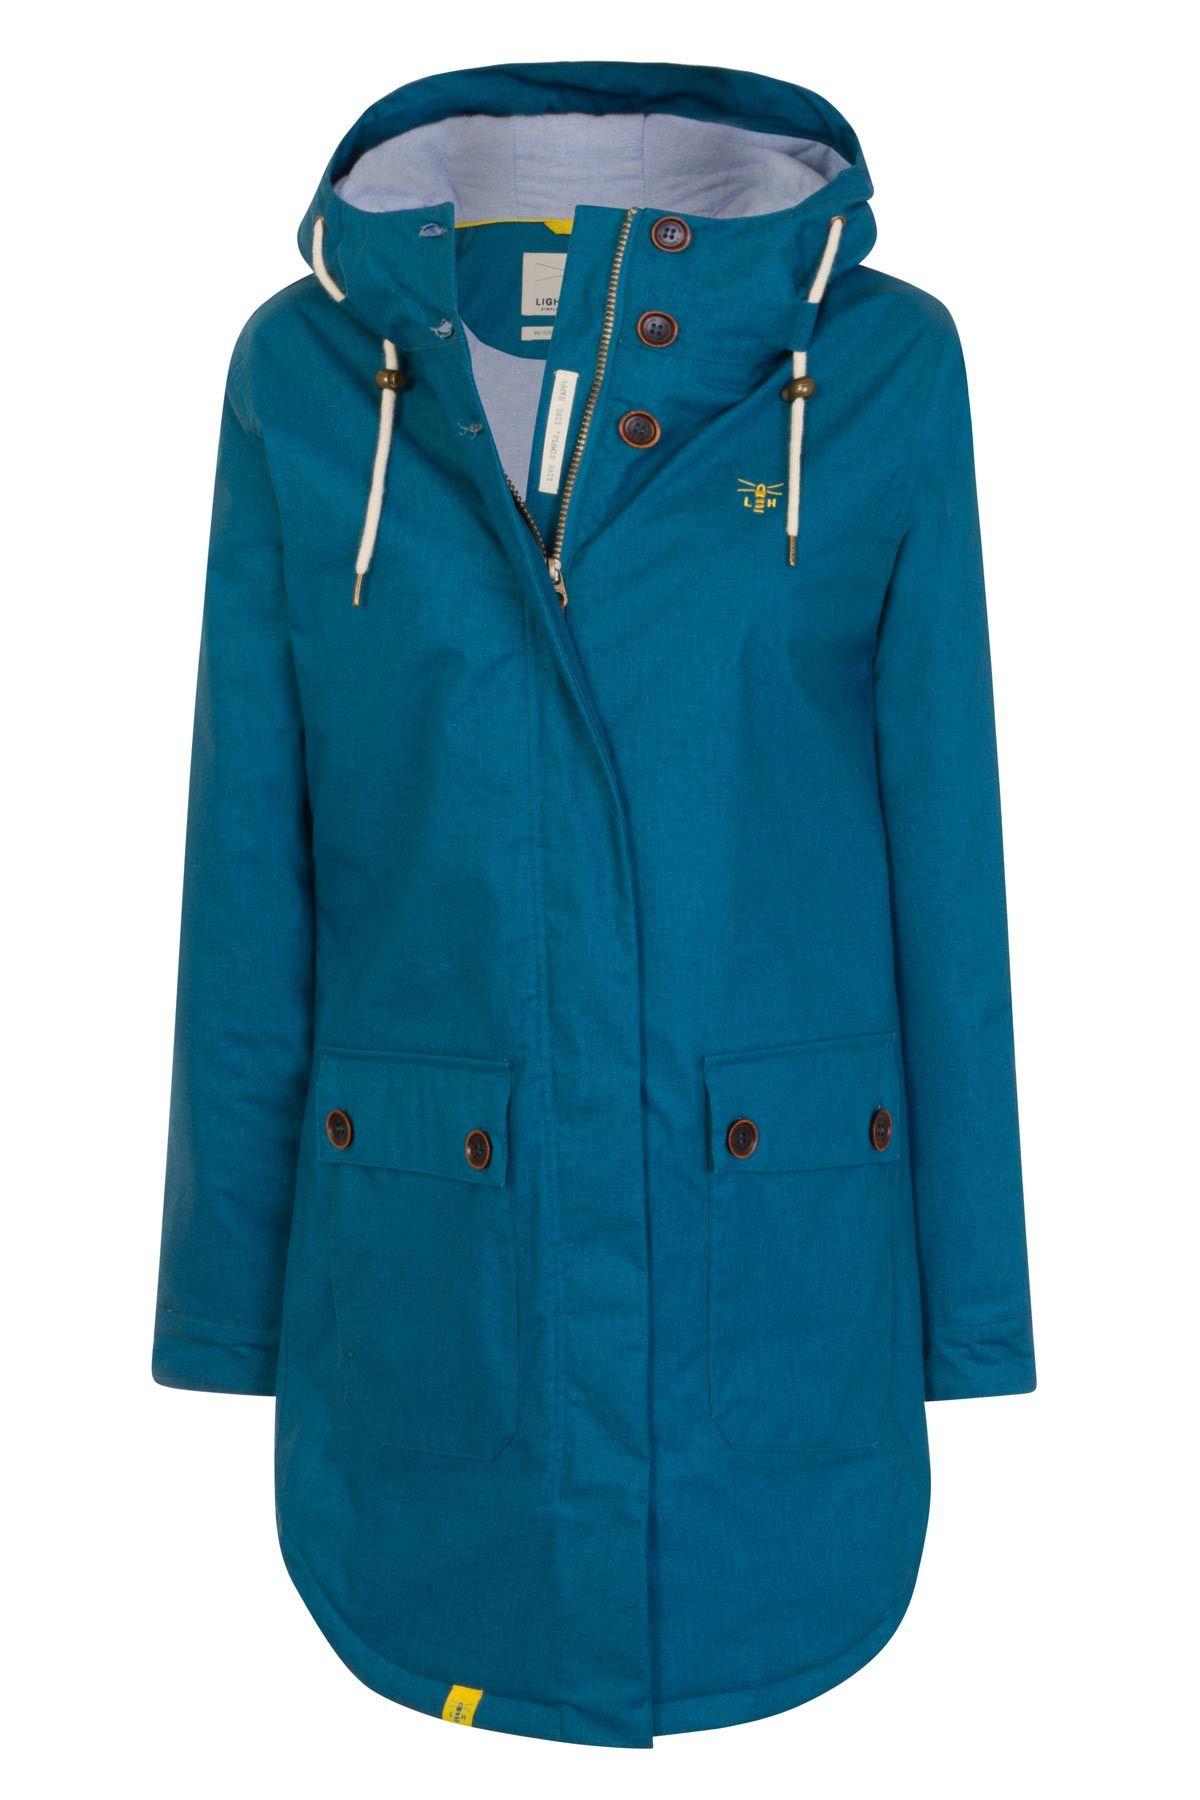 waterproof coats florence womens waterproof parka coat ANIKTVX